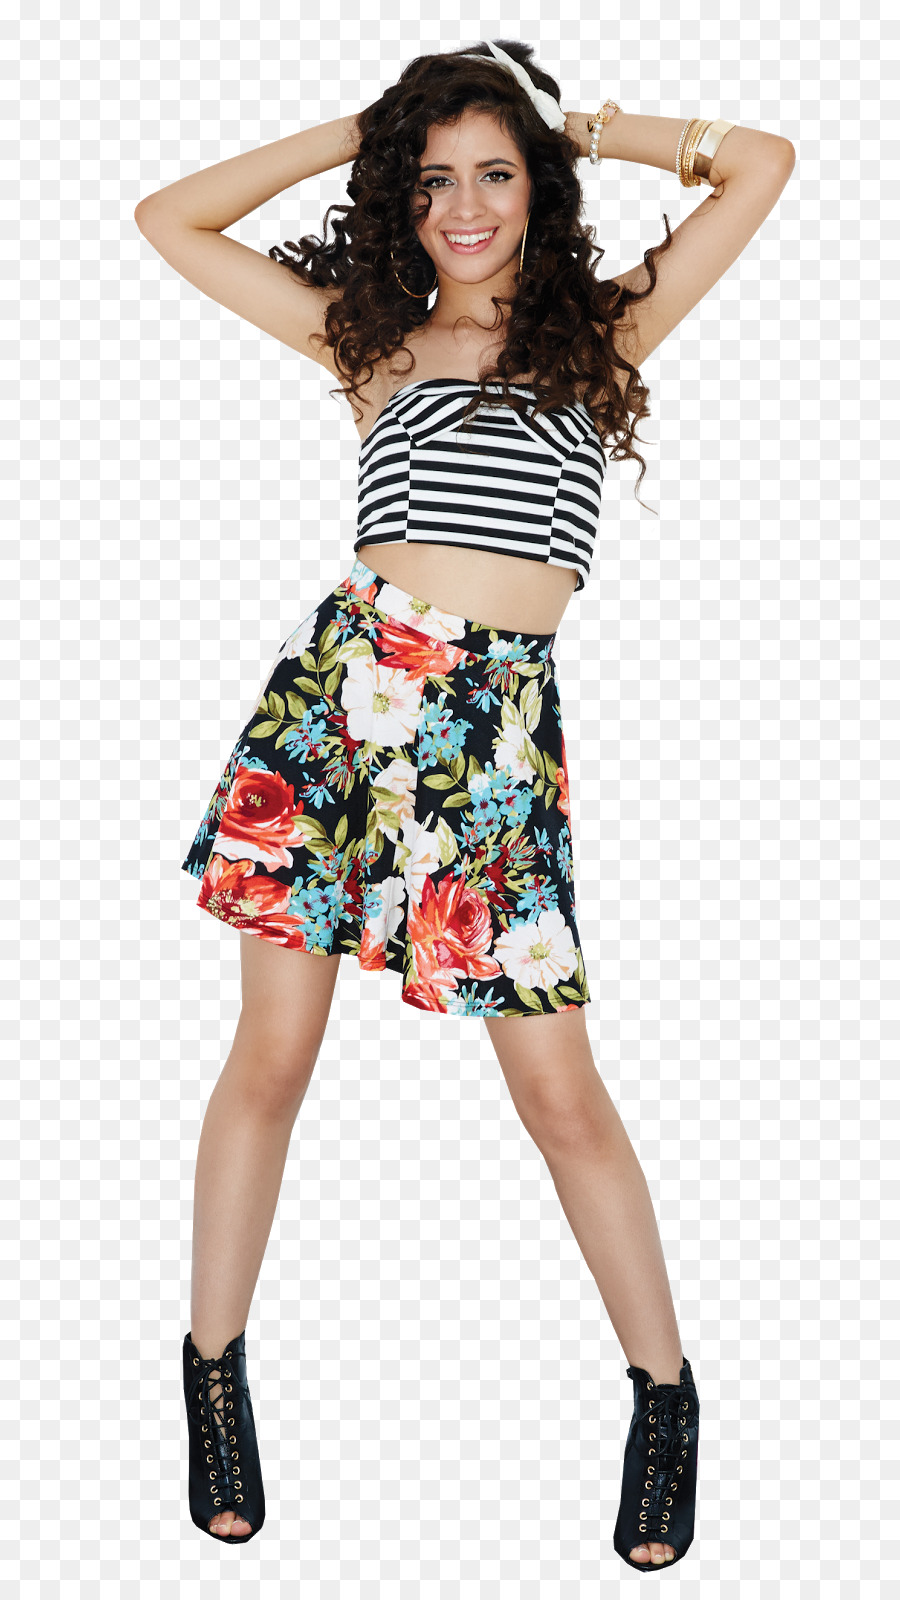 Descarga gratuita de Camila Cabello, Quinta Armonía, Ropa Imágen de Png